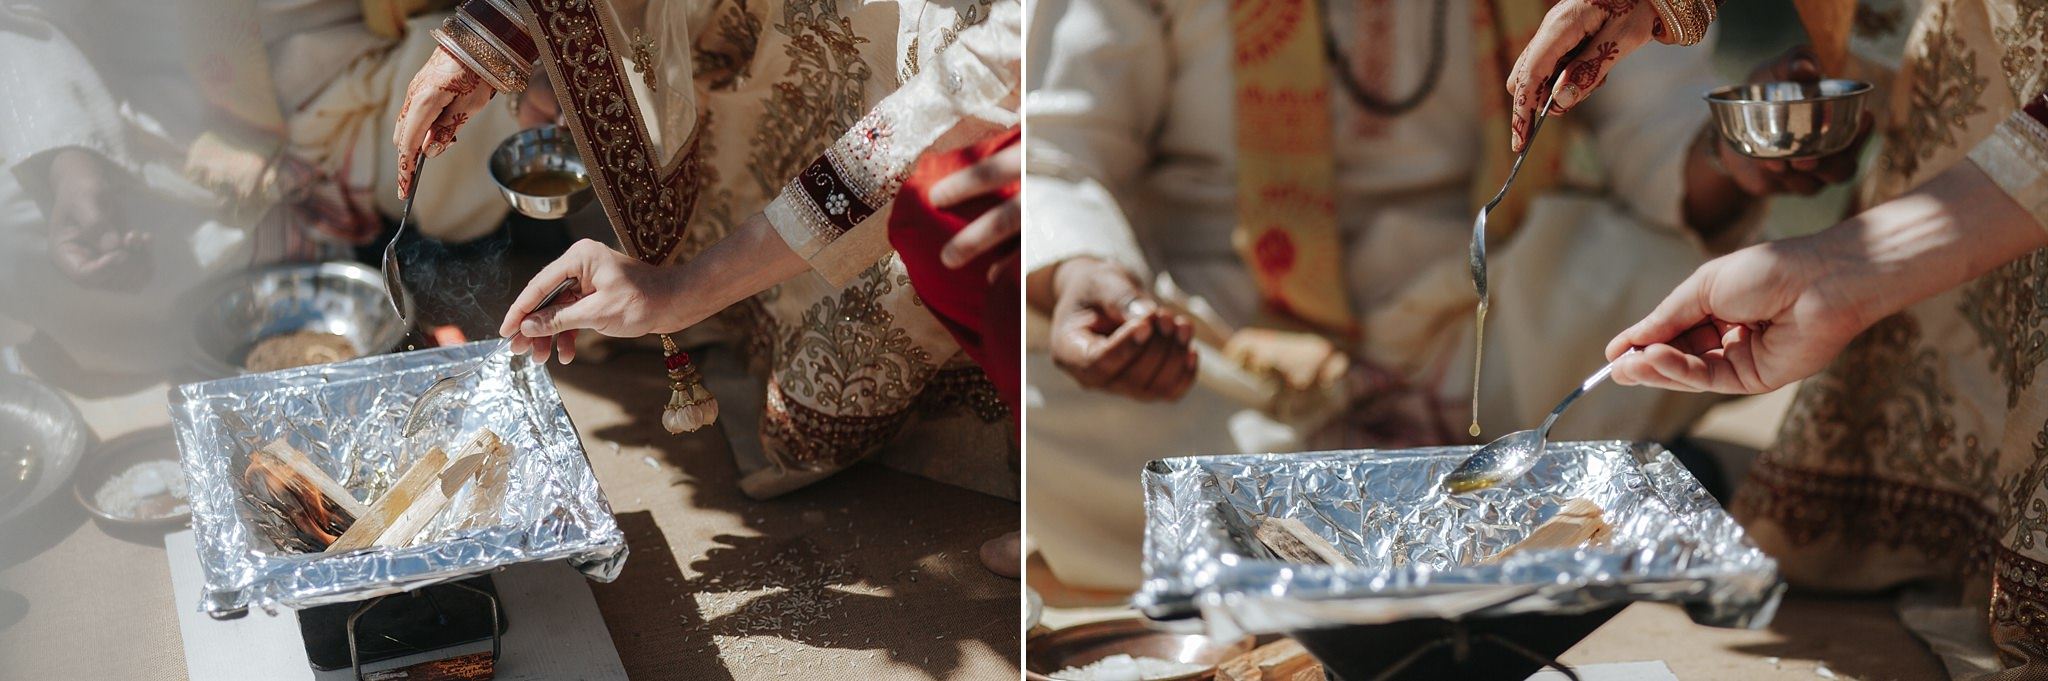 wainui-wedding-blog-aaronsami-86.jpg